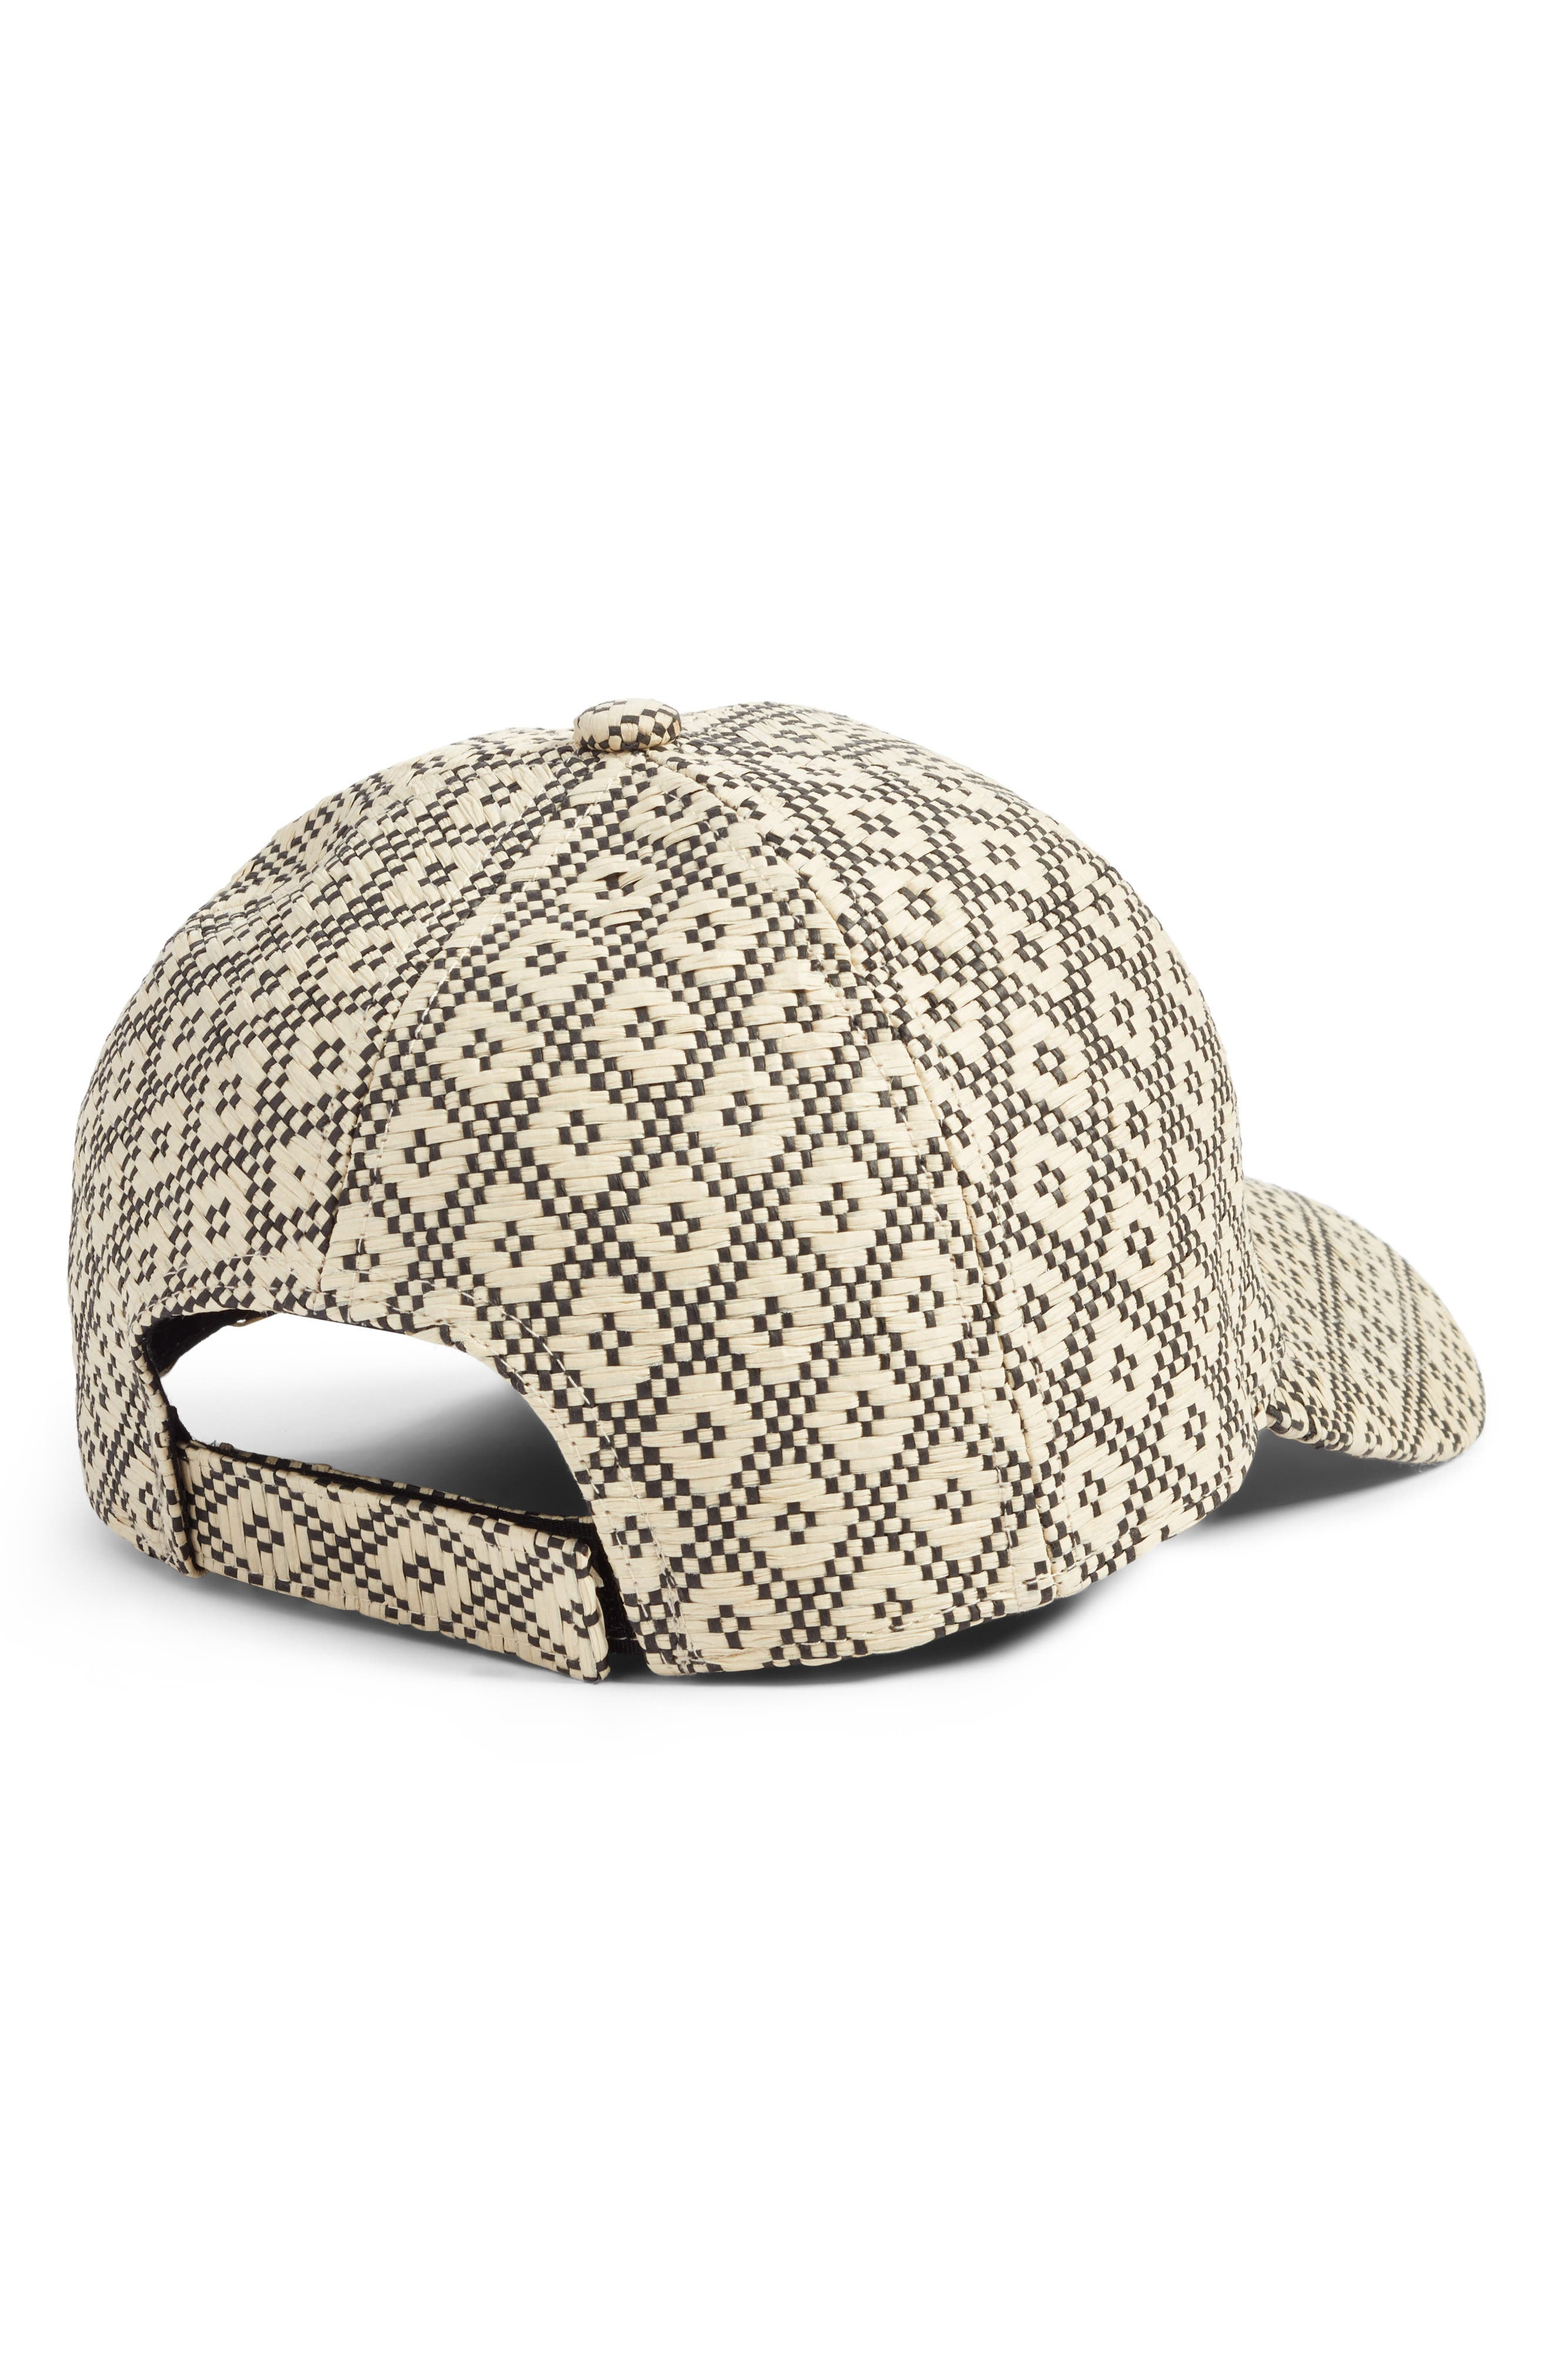 Geo Straw Baseball Cap,                             Alternate thumbnail 2, color,                             250